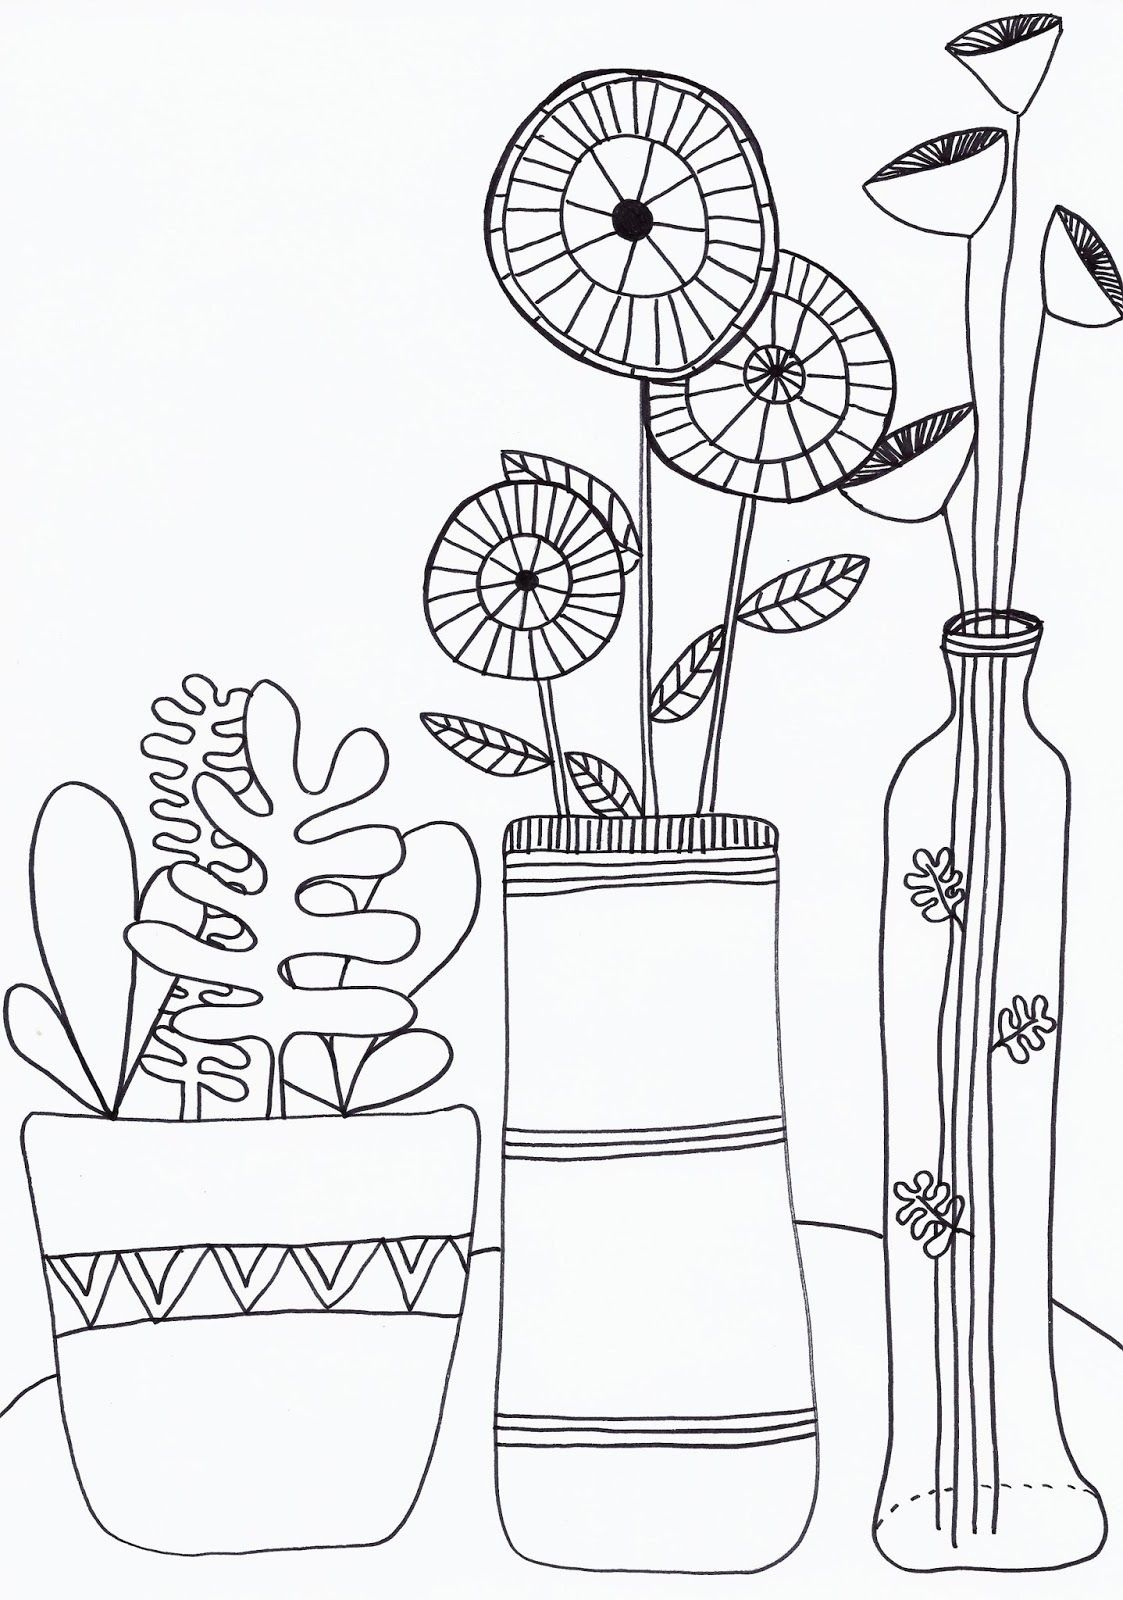 Moose Travelling Back To School Printable Drawing Kleurplaten Tekenen